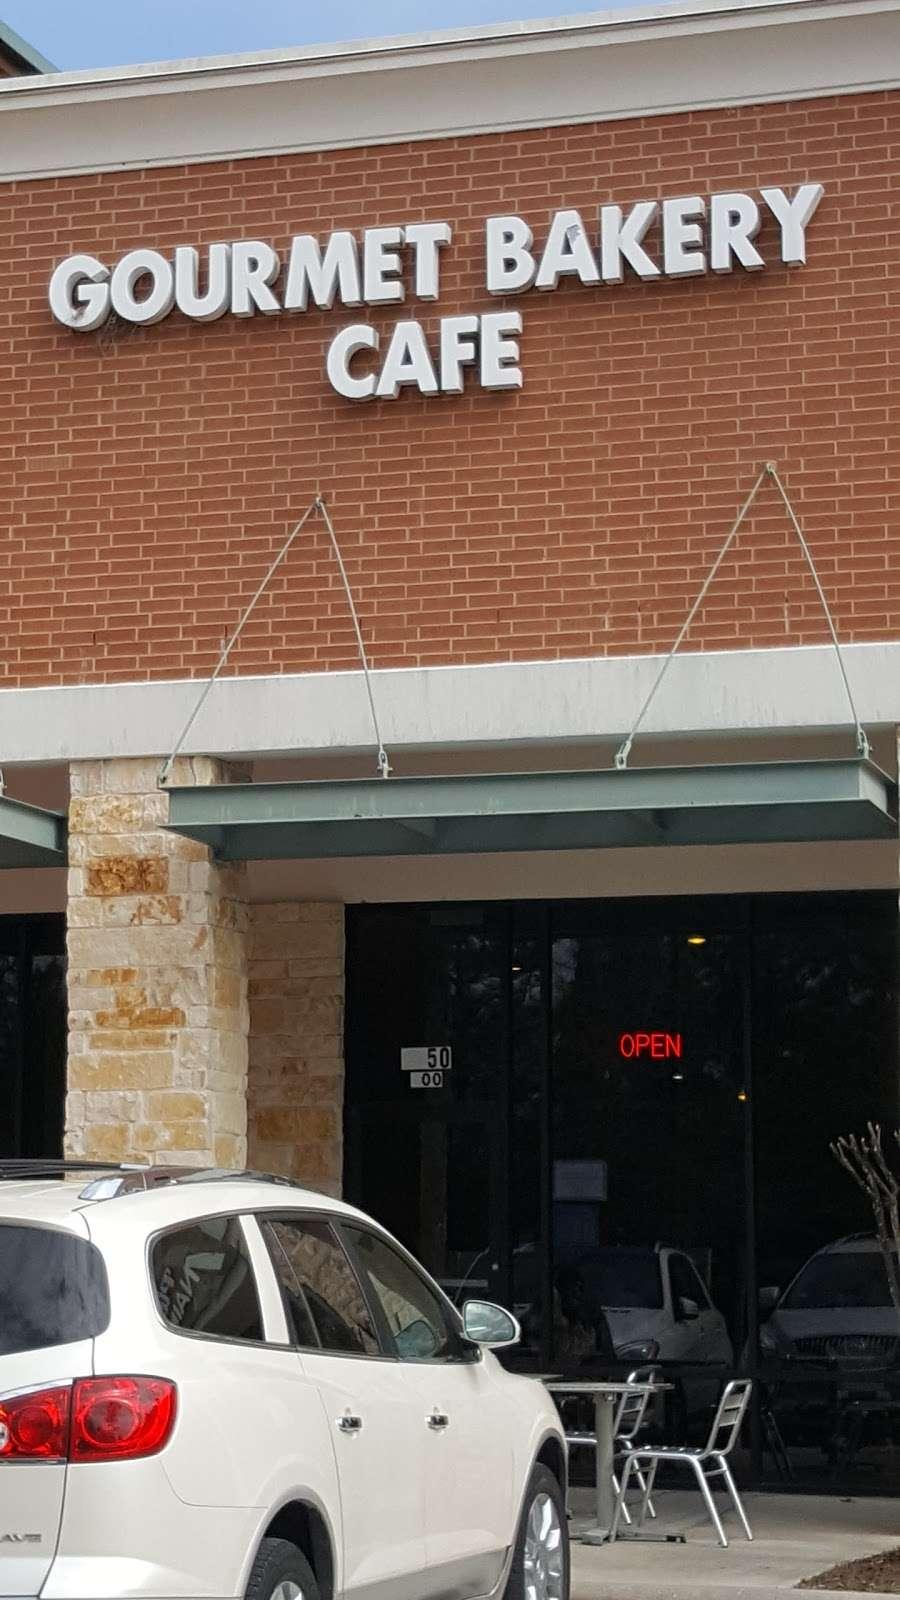 La Francesita Gourmet Bakery Cafe - cafe  | Photo 4 of 10 | Address: 9550 Woodlands Pkwy, The Woodlands, TX 77382, USA | Phone: (281) 298-9684